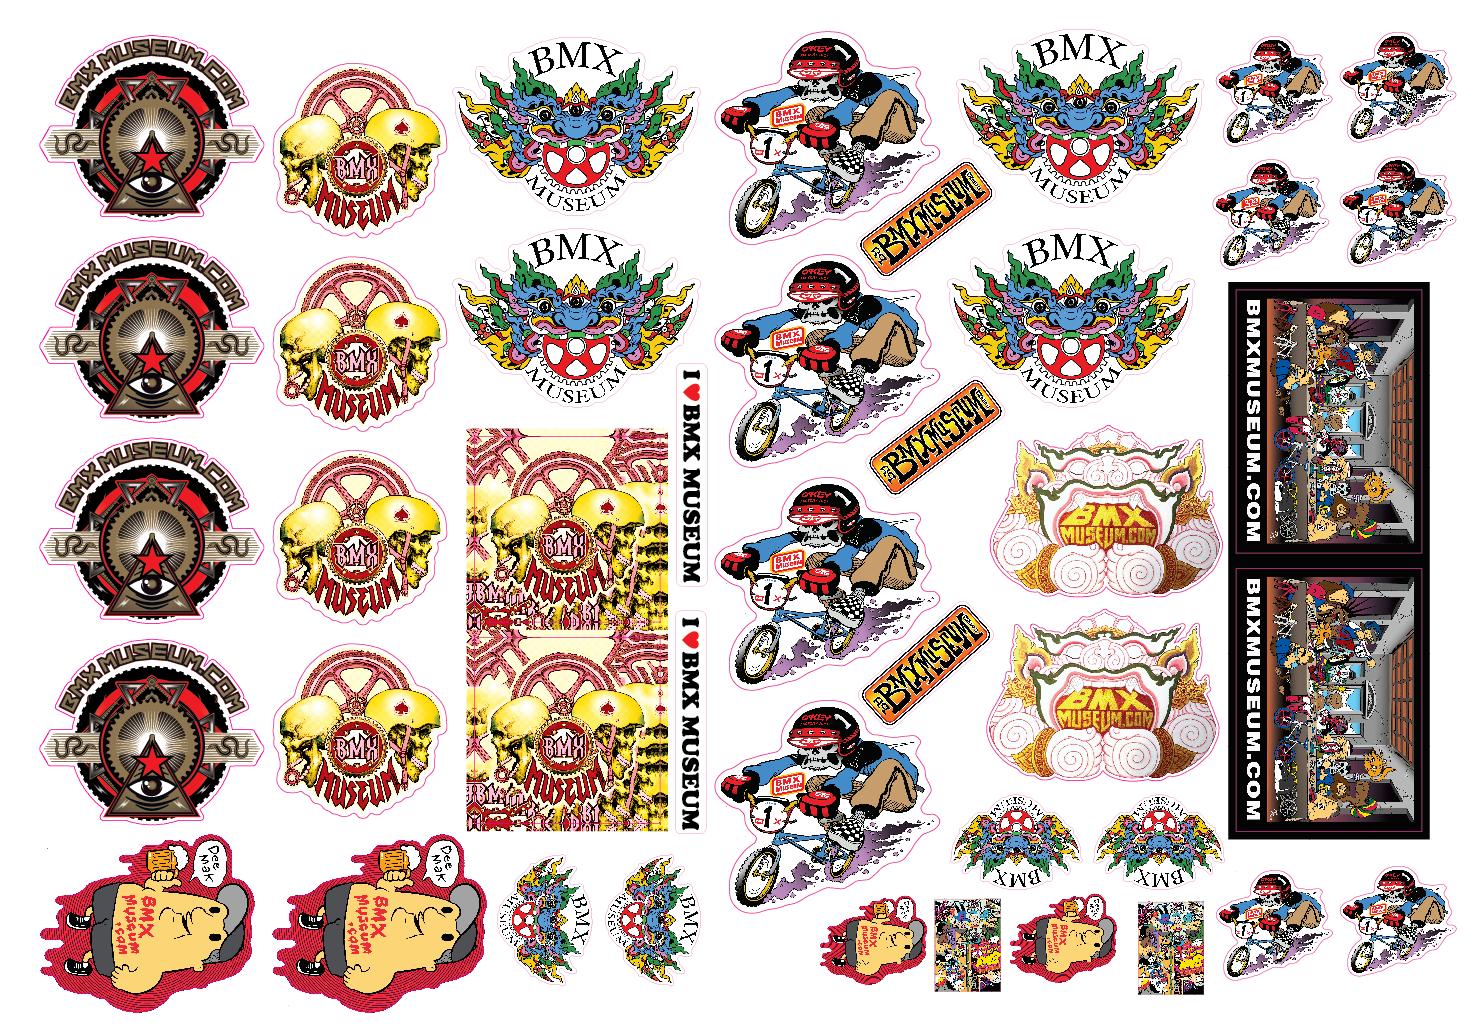 https://s3.amazonaws.com/uploads.bmxmuseum.com/user-images/152/new-stickers5db1c2e3d9.png